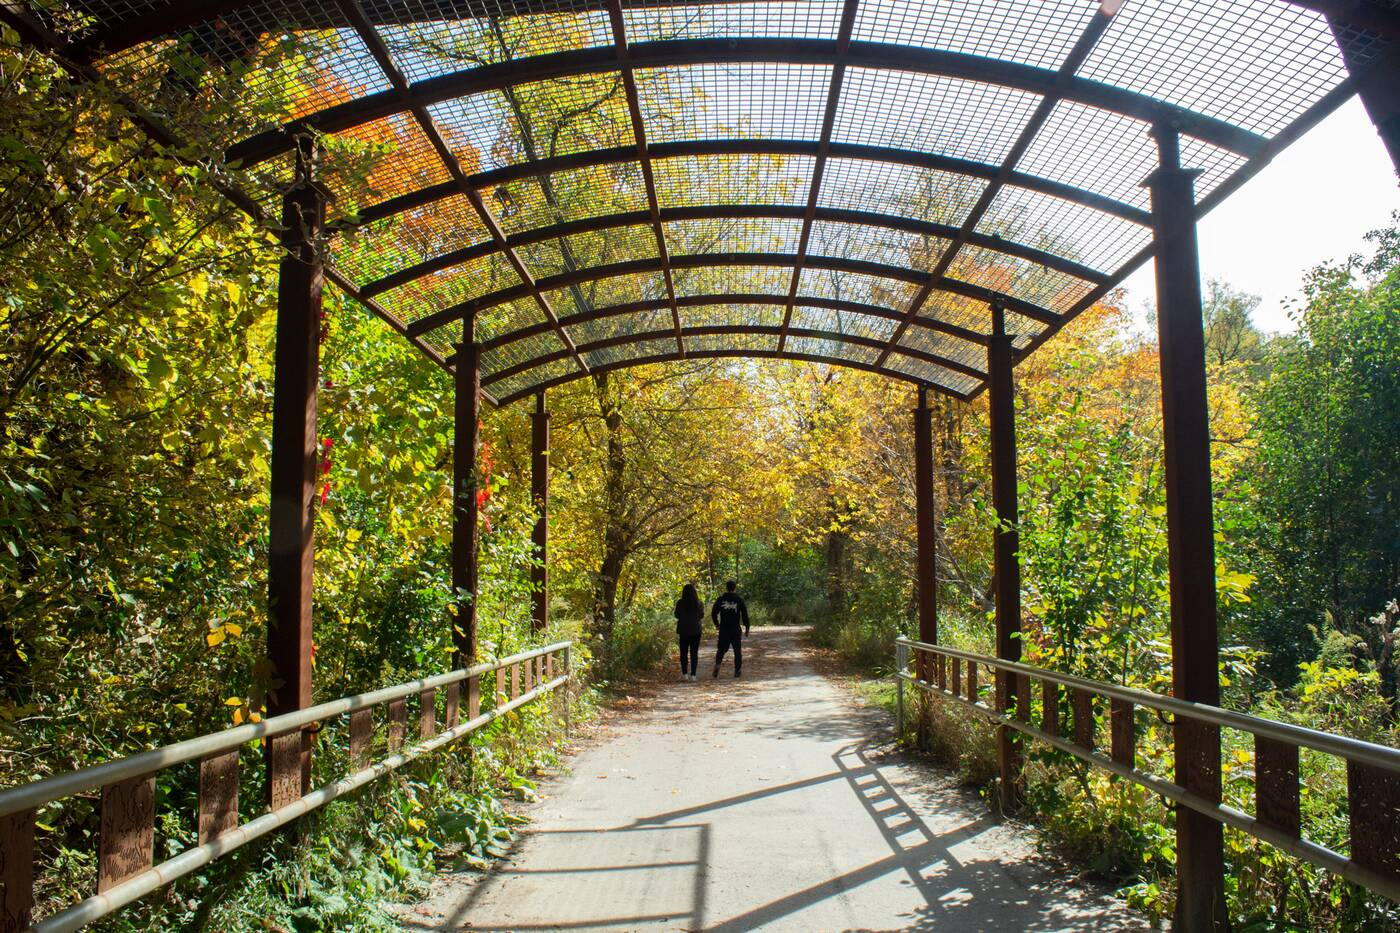 charles sauriol conservation area